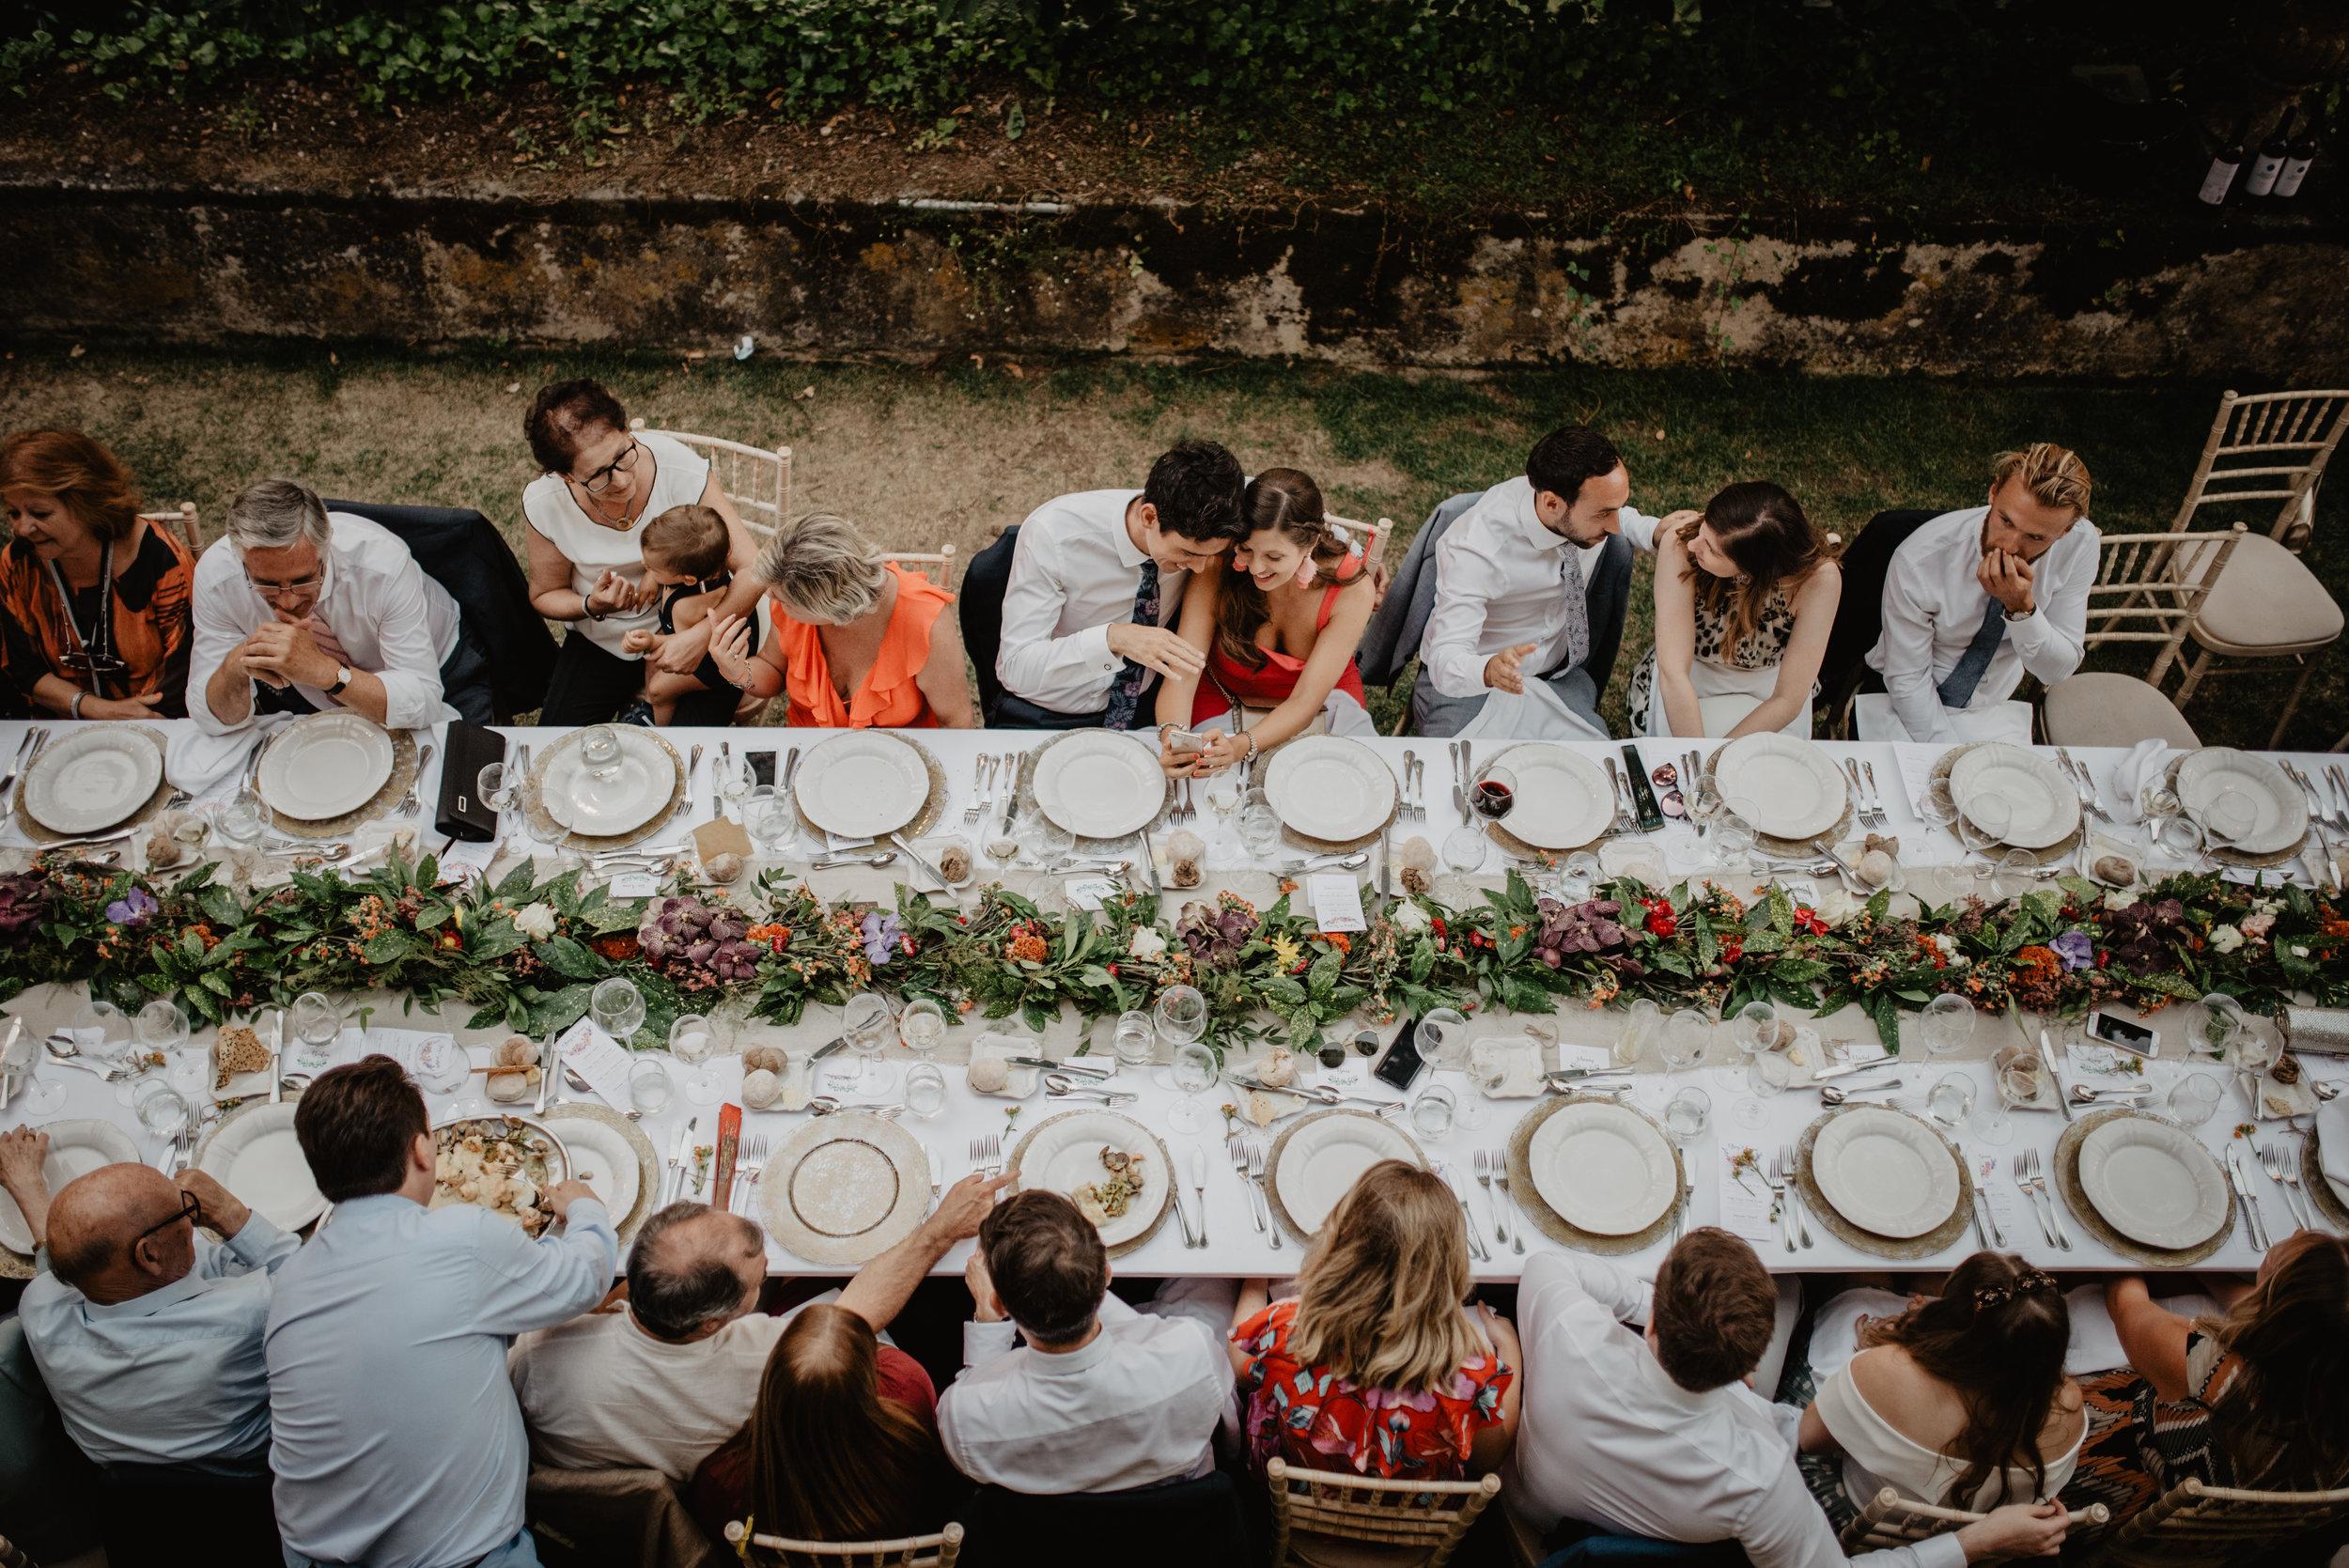 Lapela-photography-wedding-sintra-portugal-120.jpg